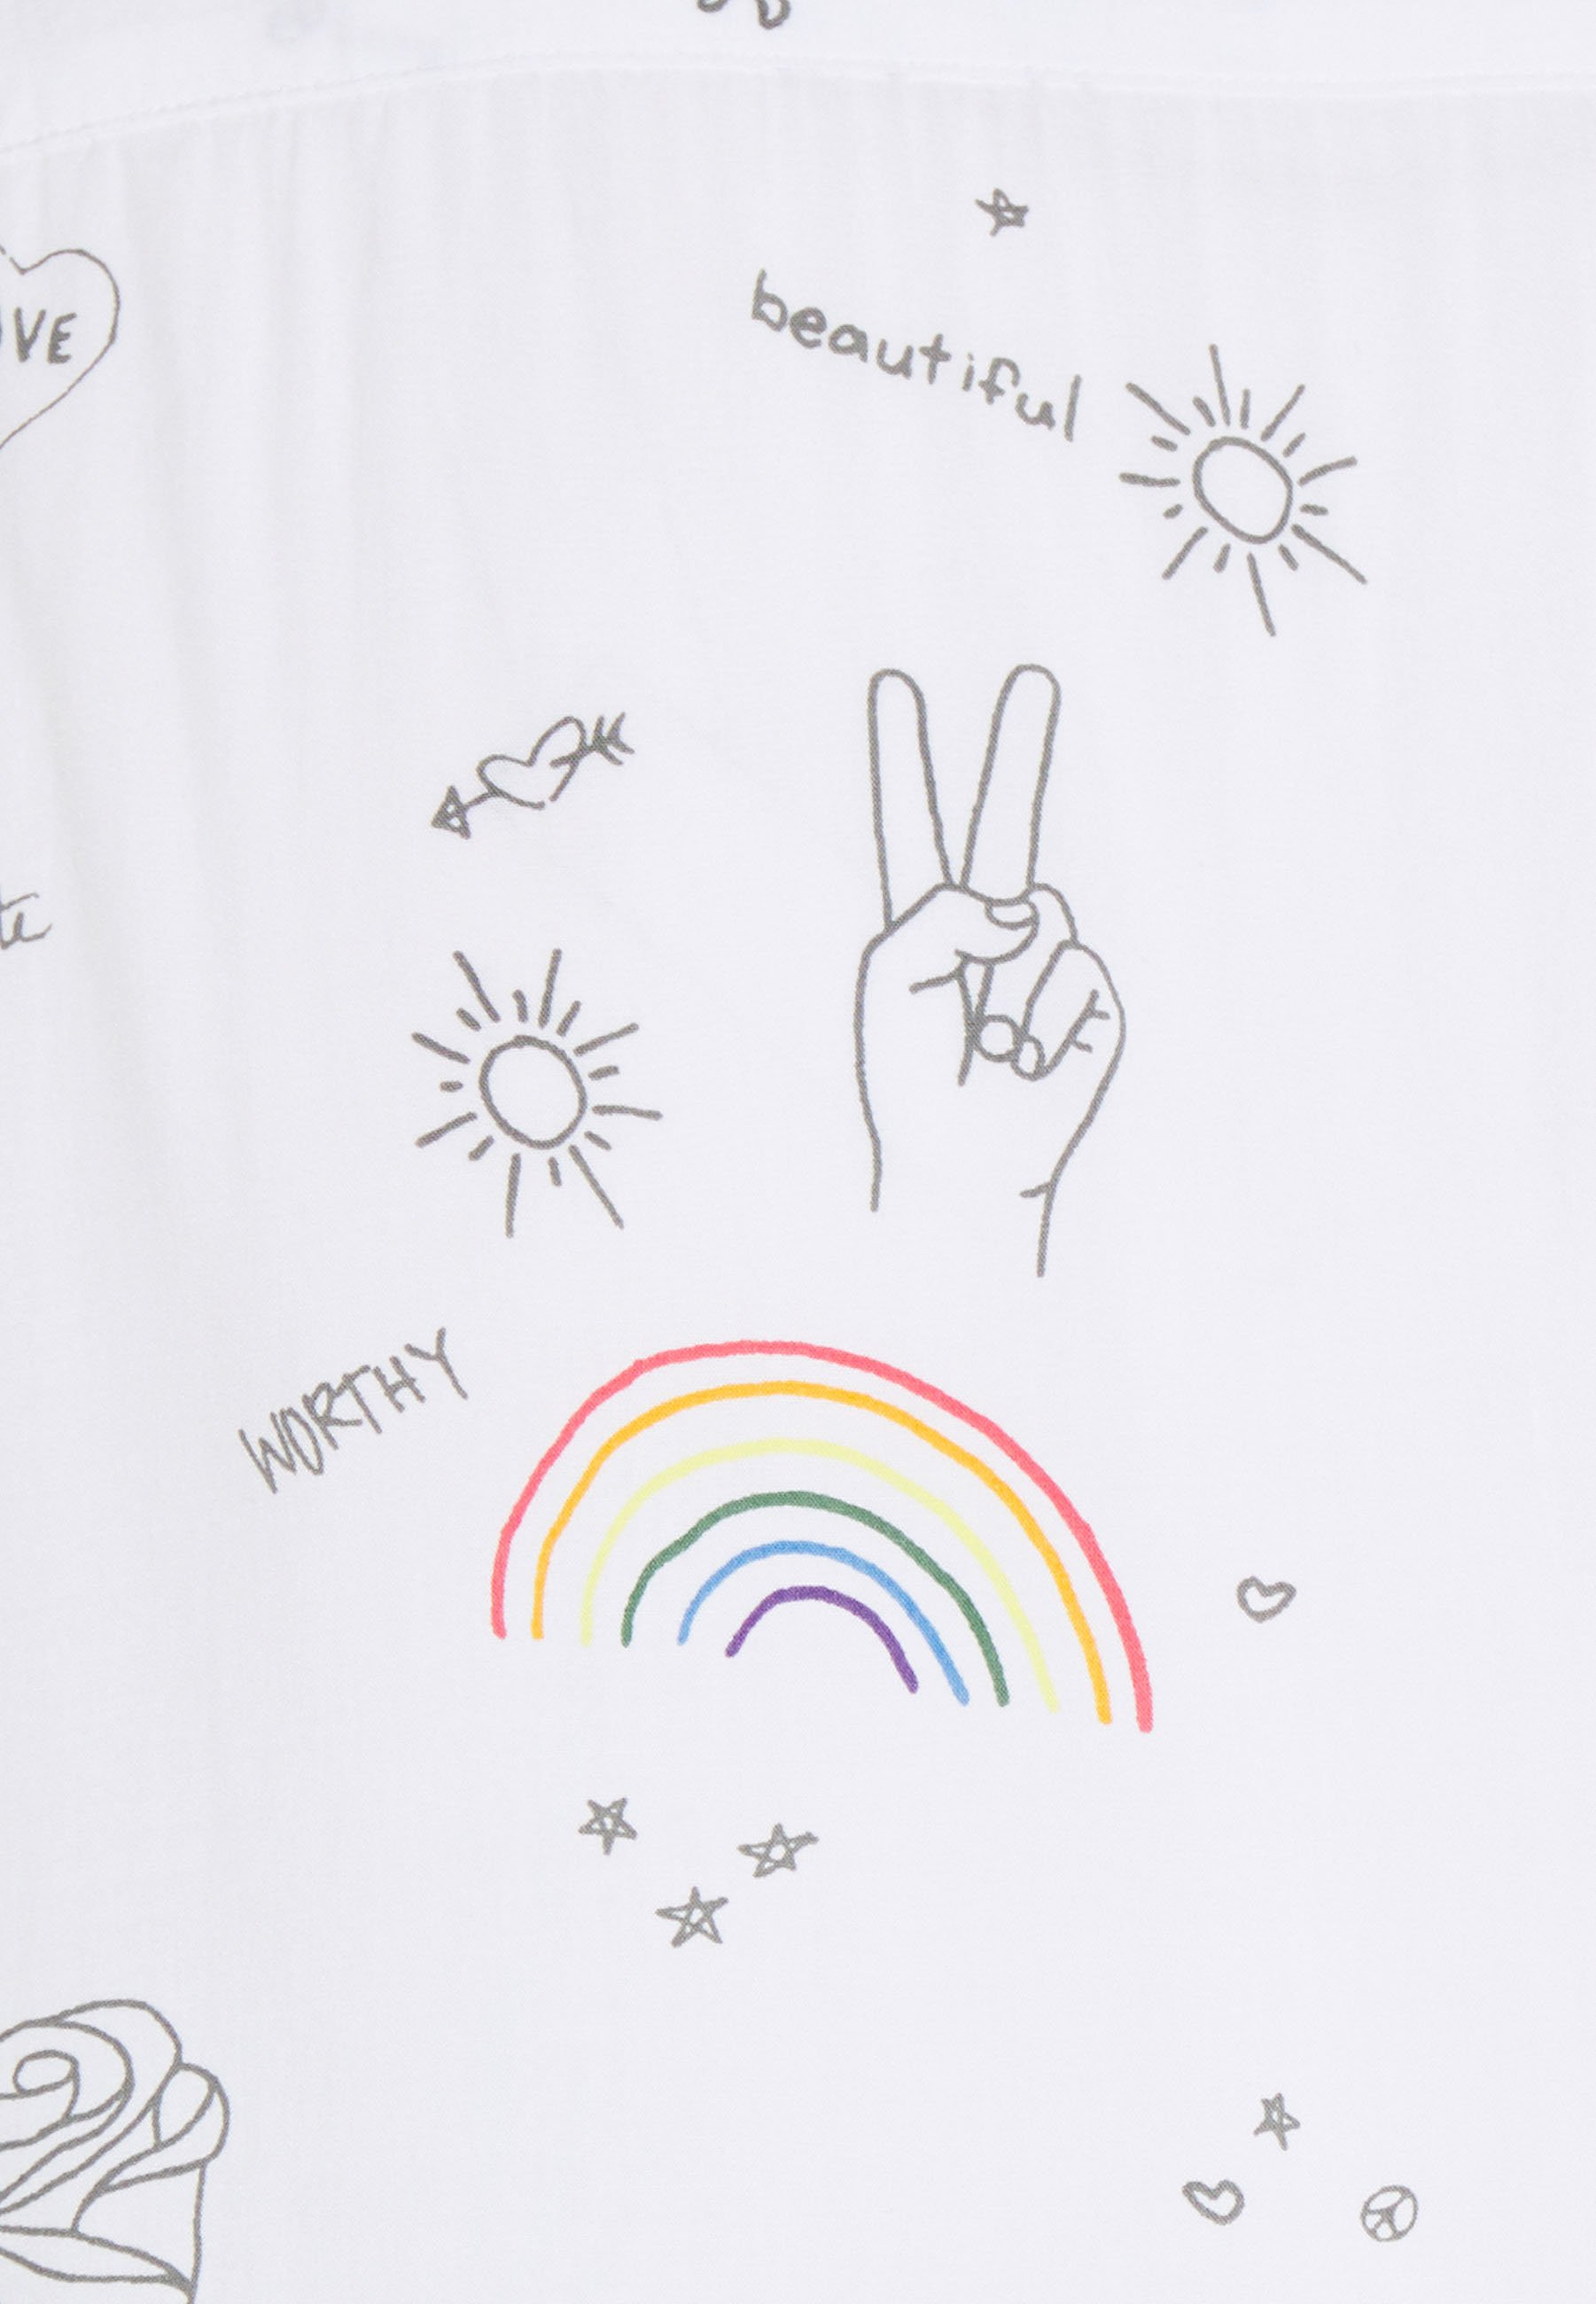 Abercrombie & Fitch Pride Resort - Skjorter White